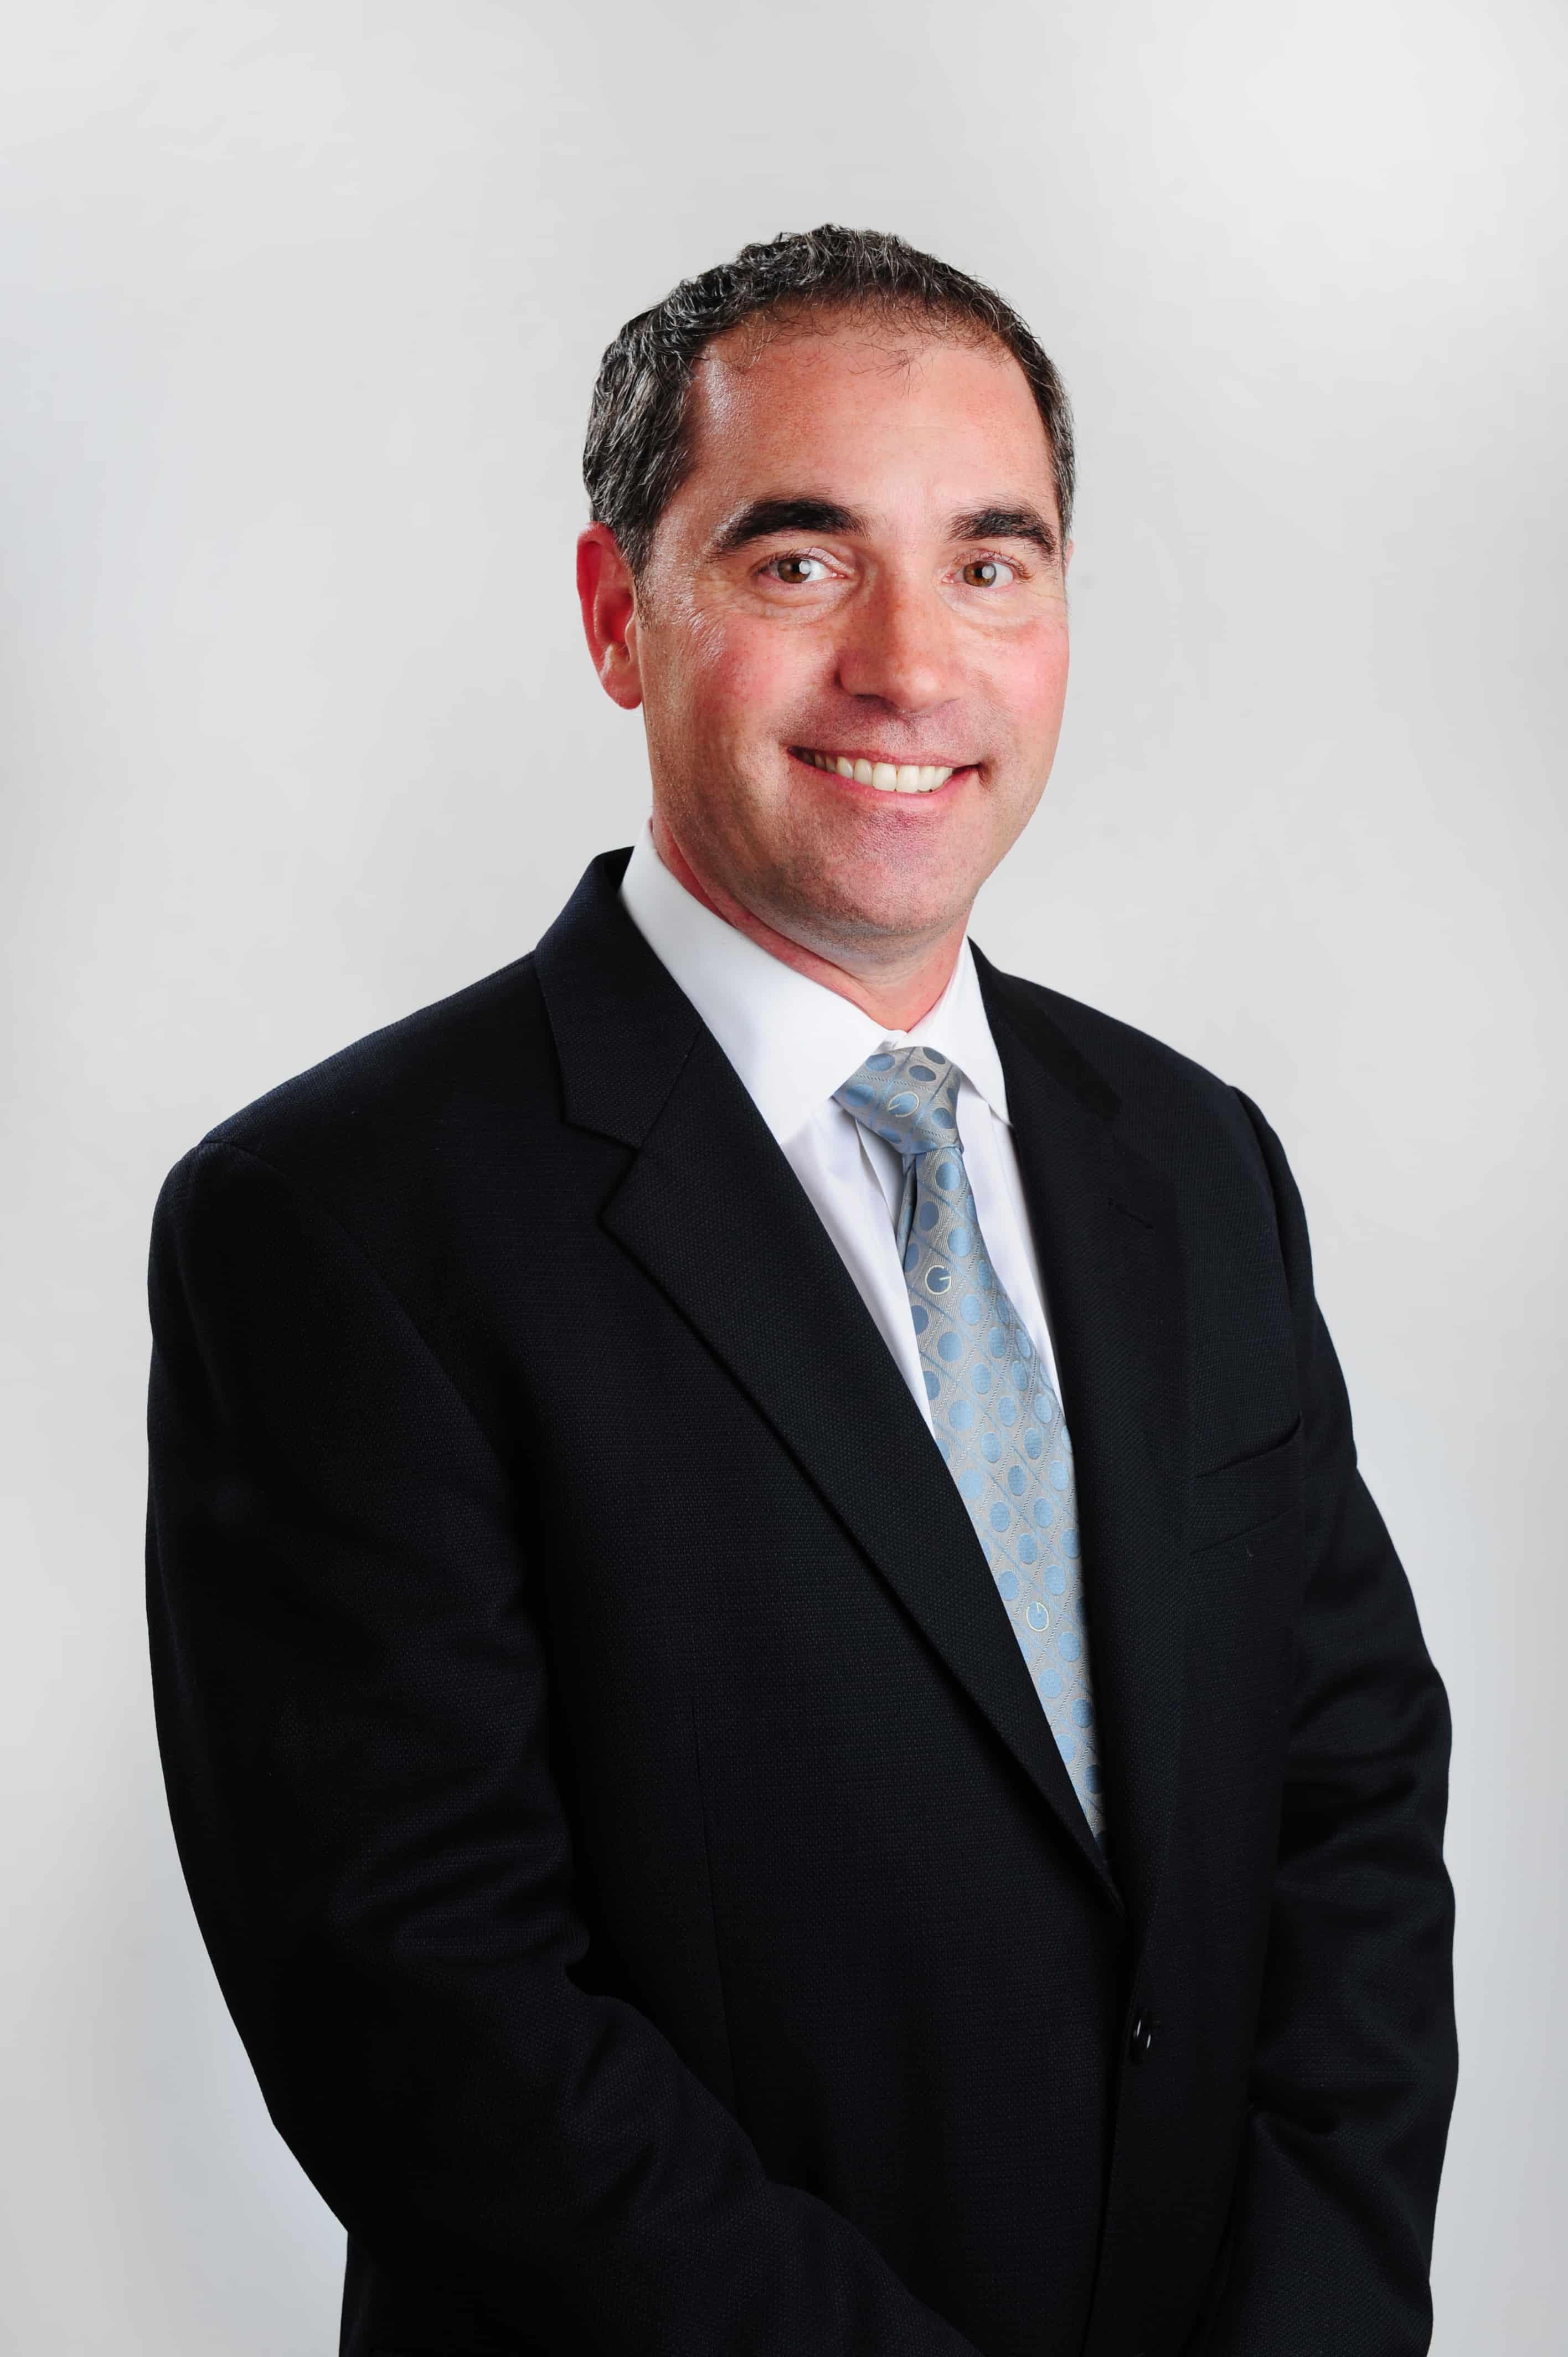 Podiatrist Dr. Robert Baglio